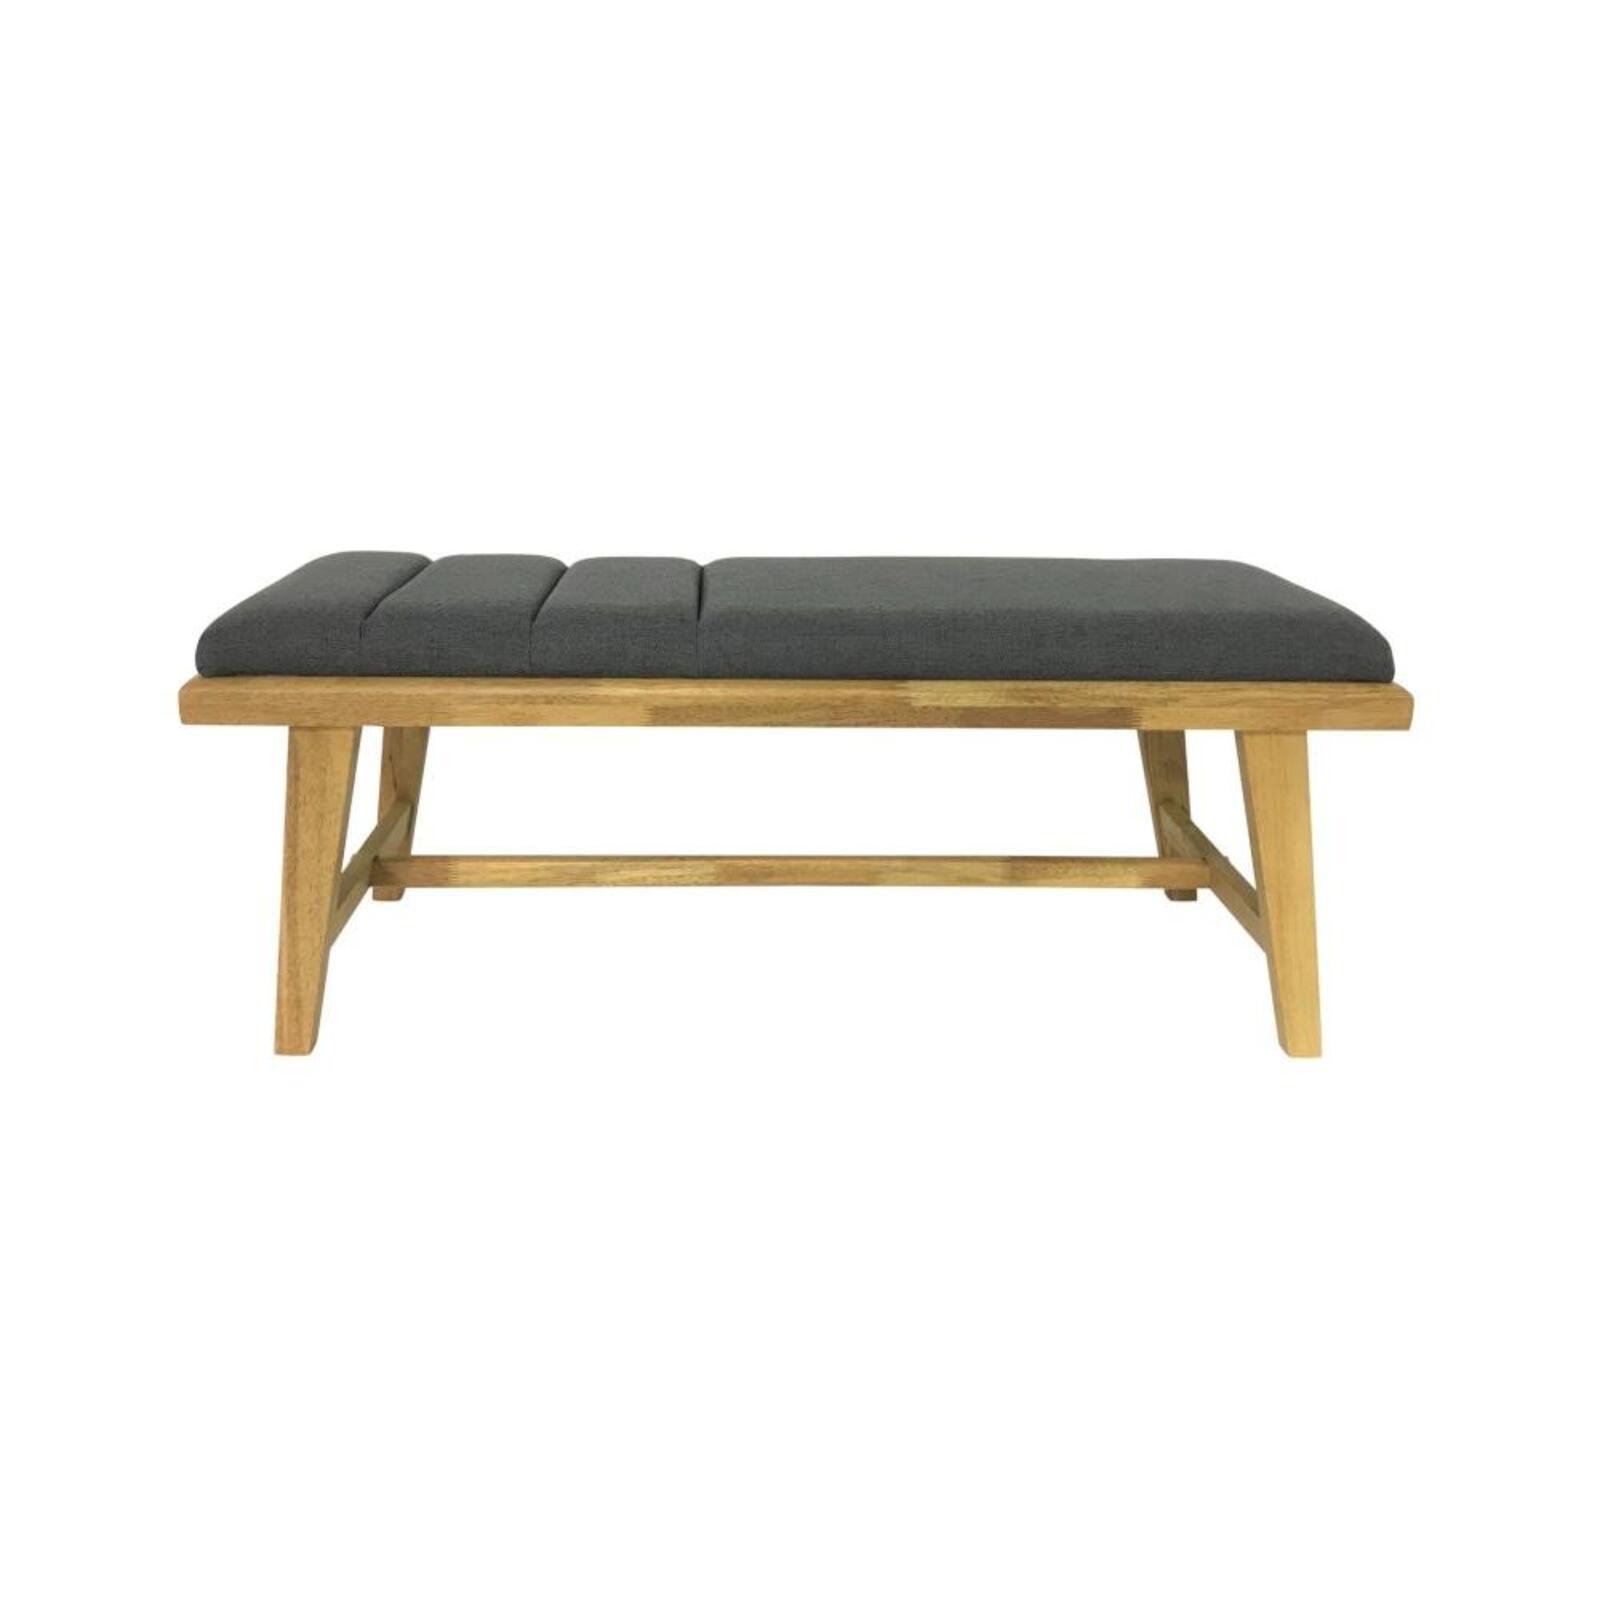 Malmo Scandinavian Fabric Dining Bench Wooden Frame - Grey